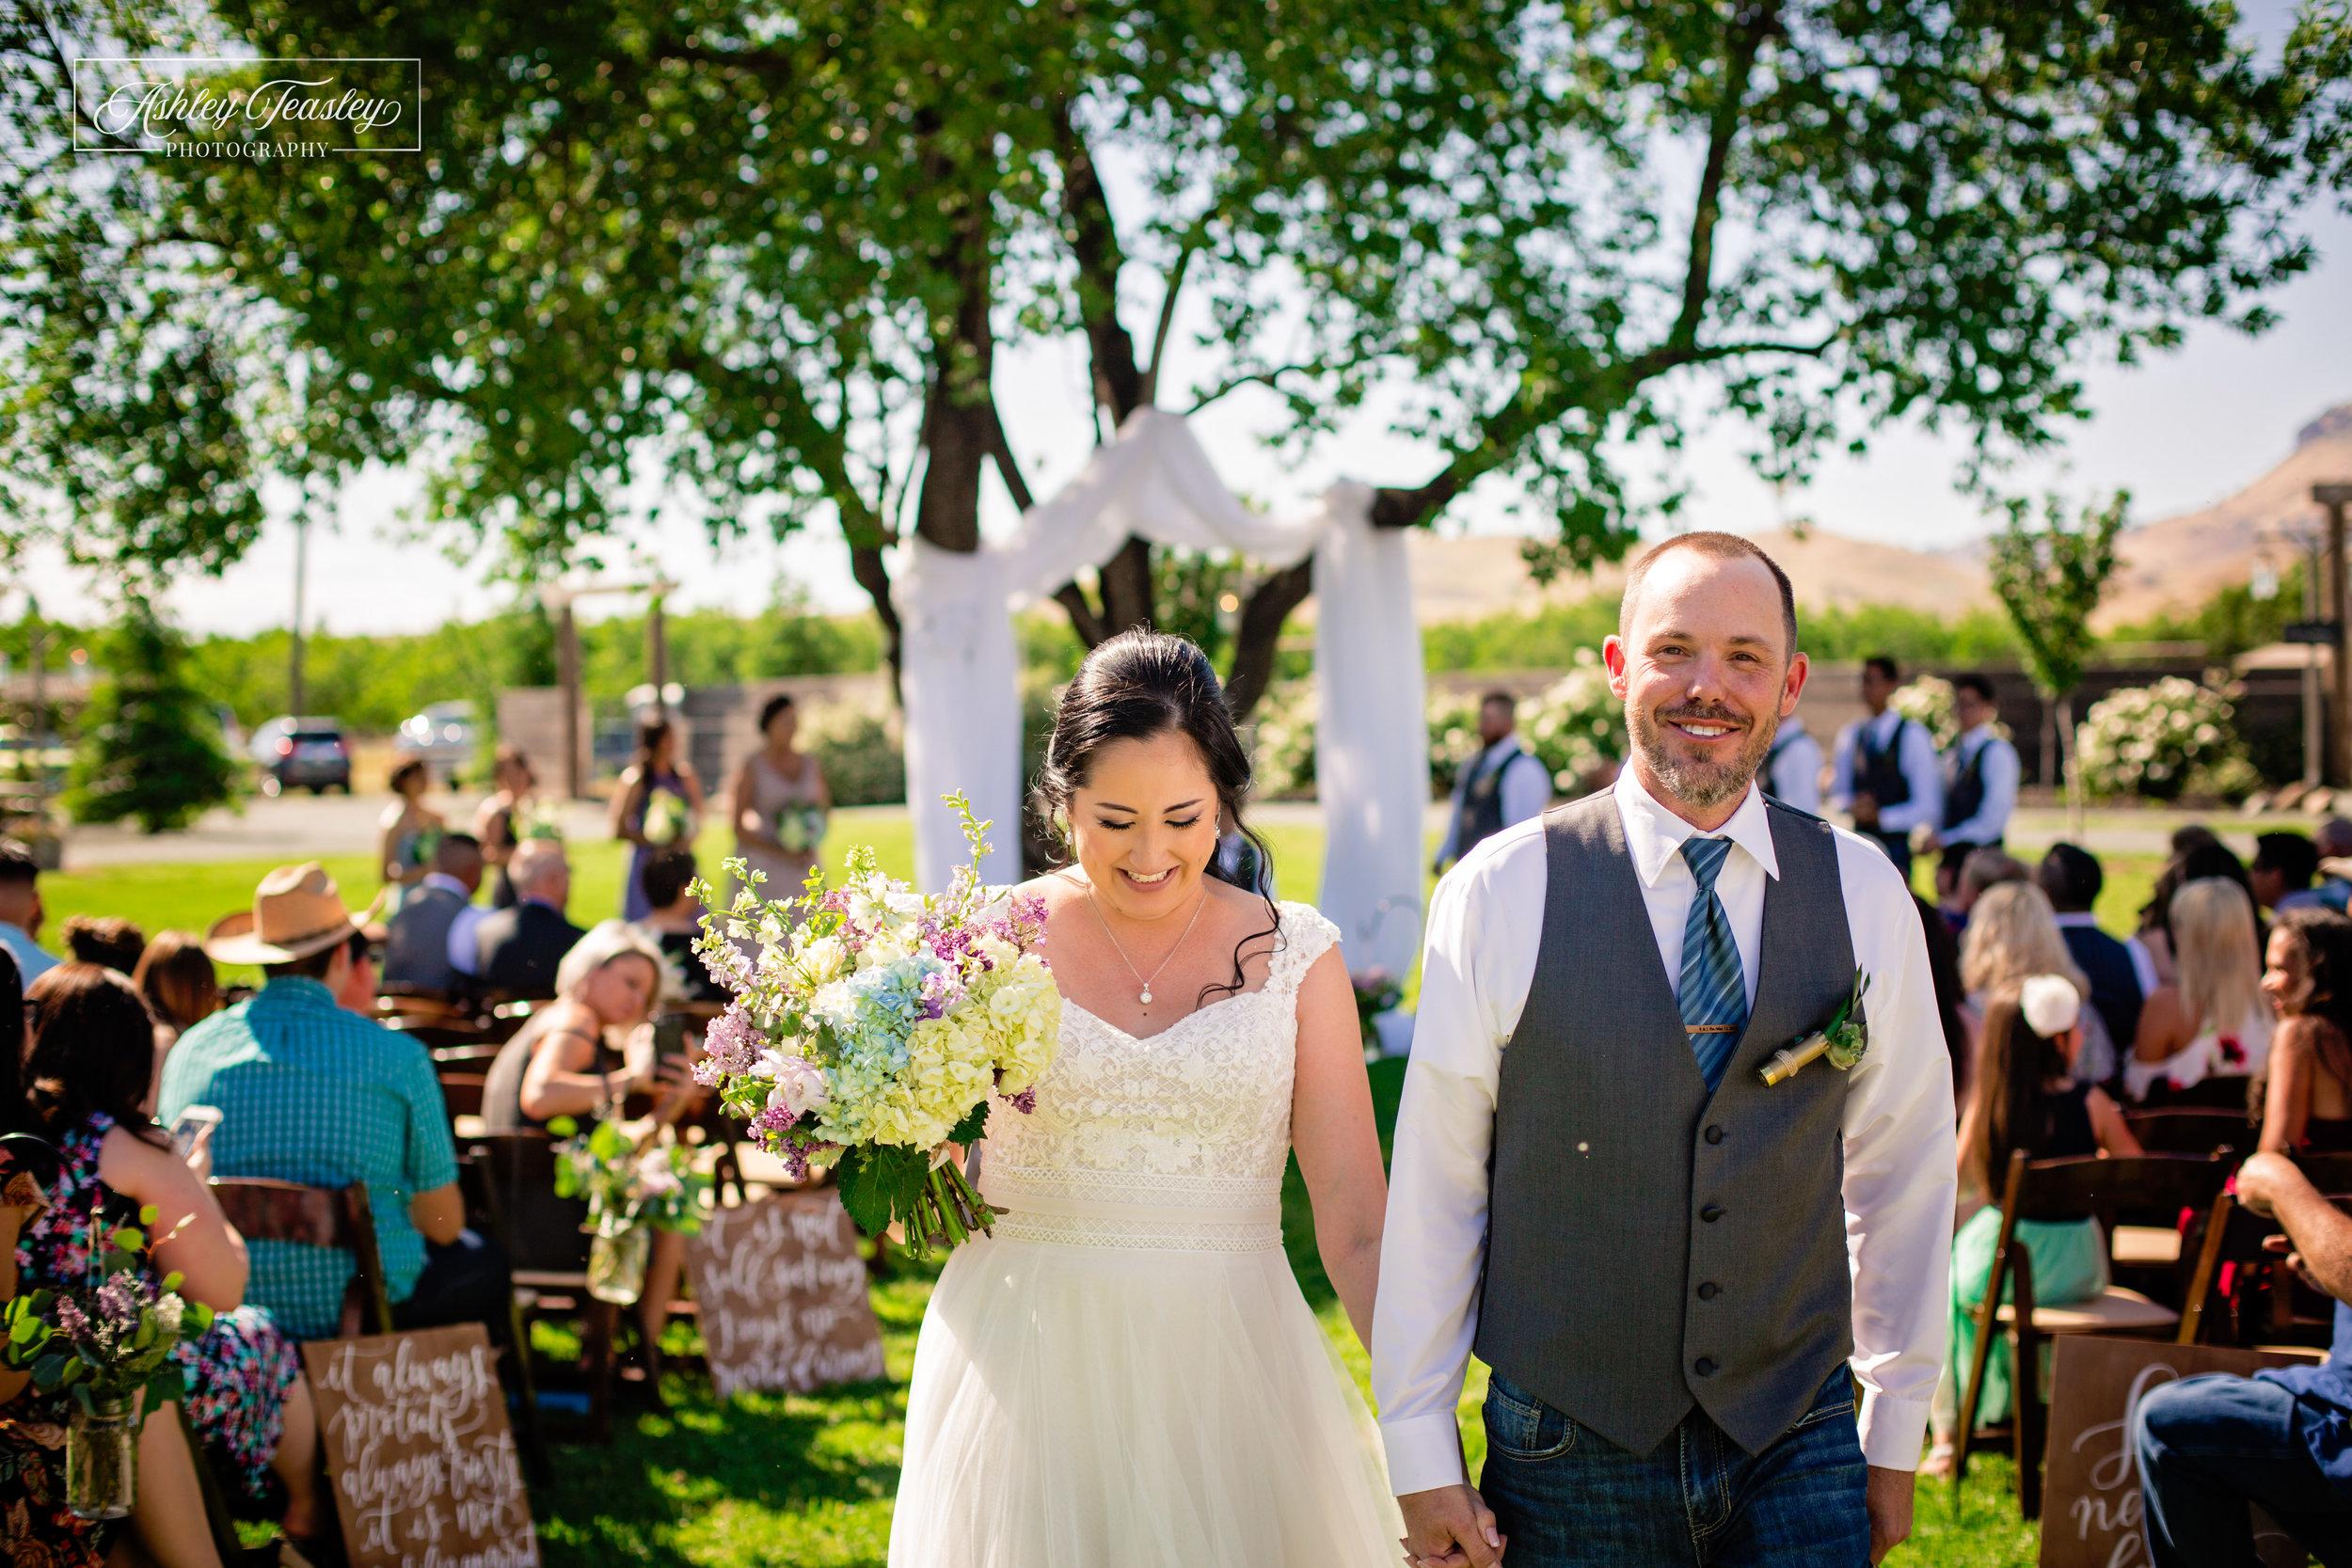 Jeanette & Rance - Butte Star Ranch - Sacramento Wedding Photographer - Ashley Teasley Photography (16 of 41).jpg